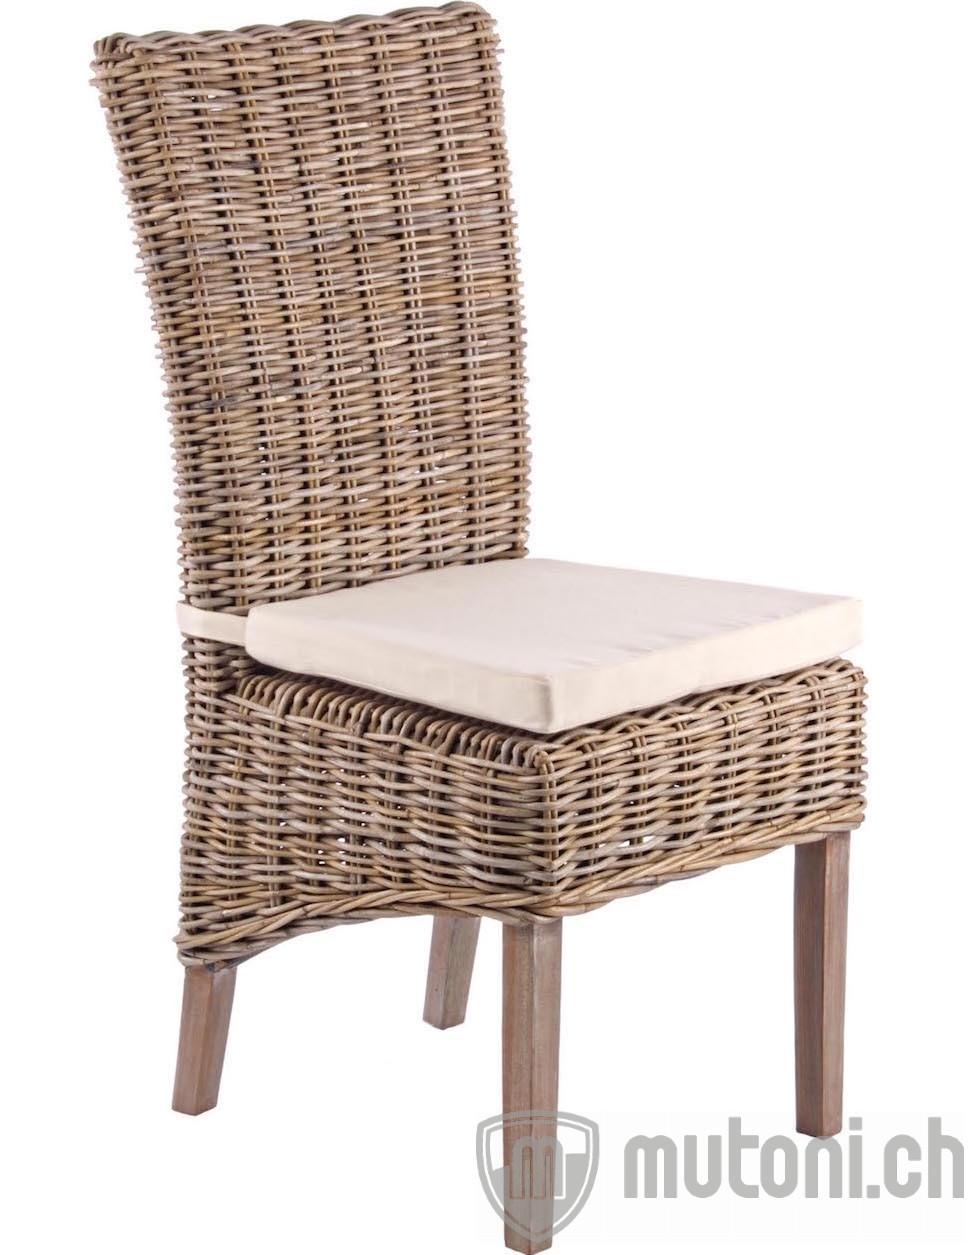 gartenstuhl rattan mit kissen luzia mutoni garten deluxe mutoni m bel. Black Bedroom Furniture Sets. Home Design Ideas